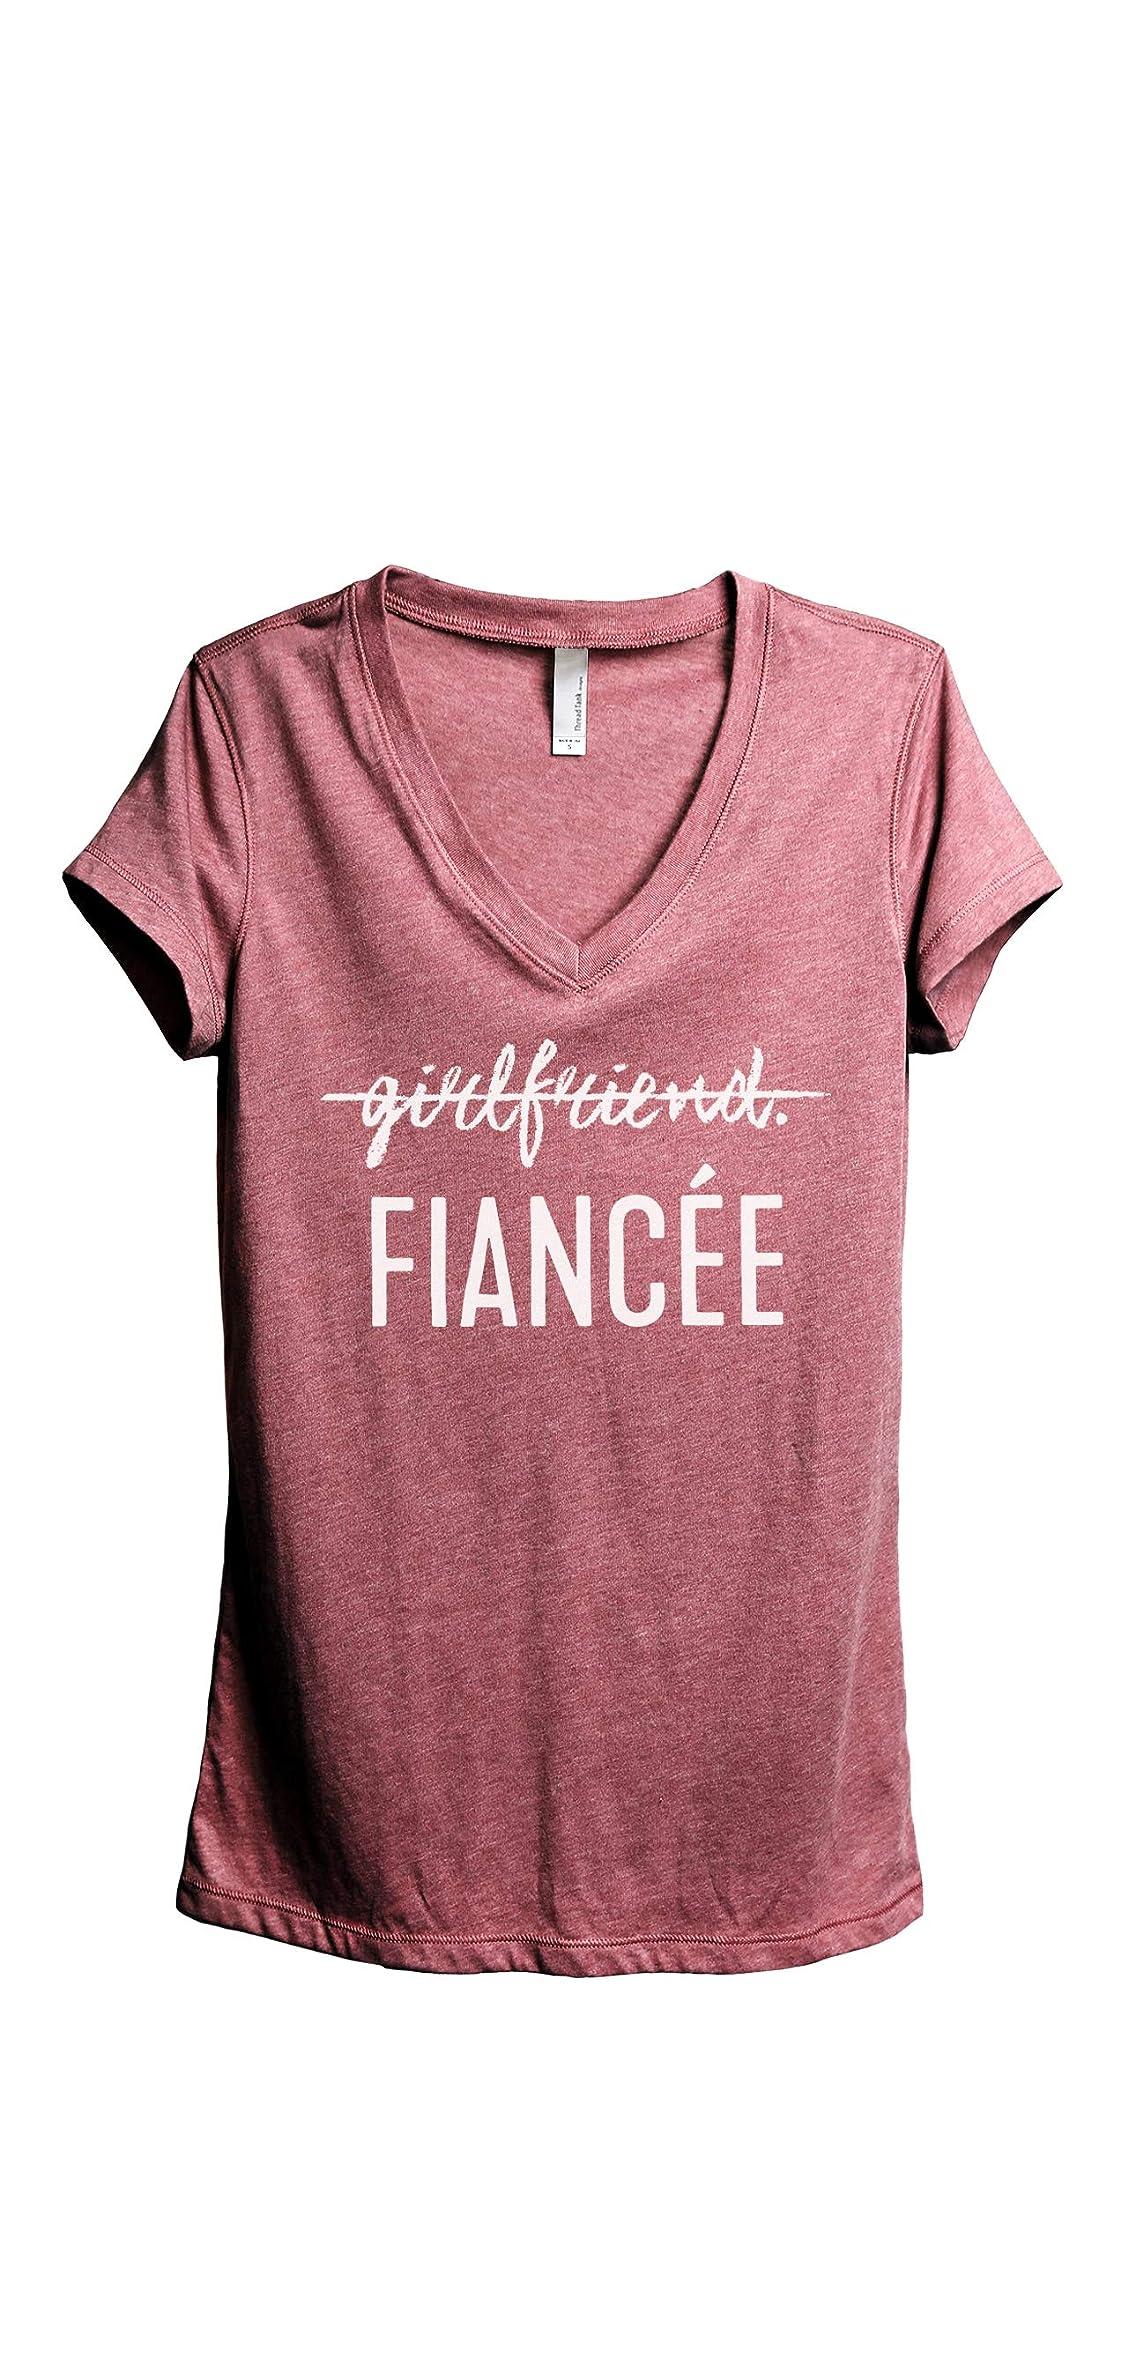 Girlfriend Fiancee Women's Fashion Relaxed V-neck